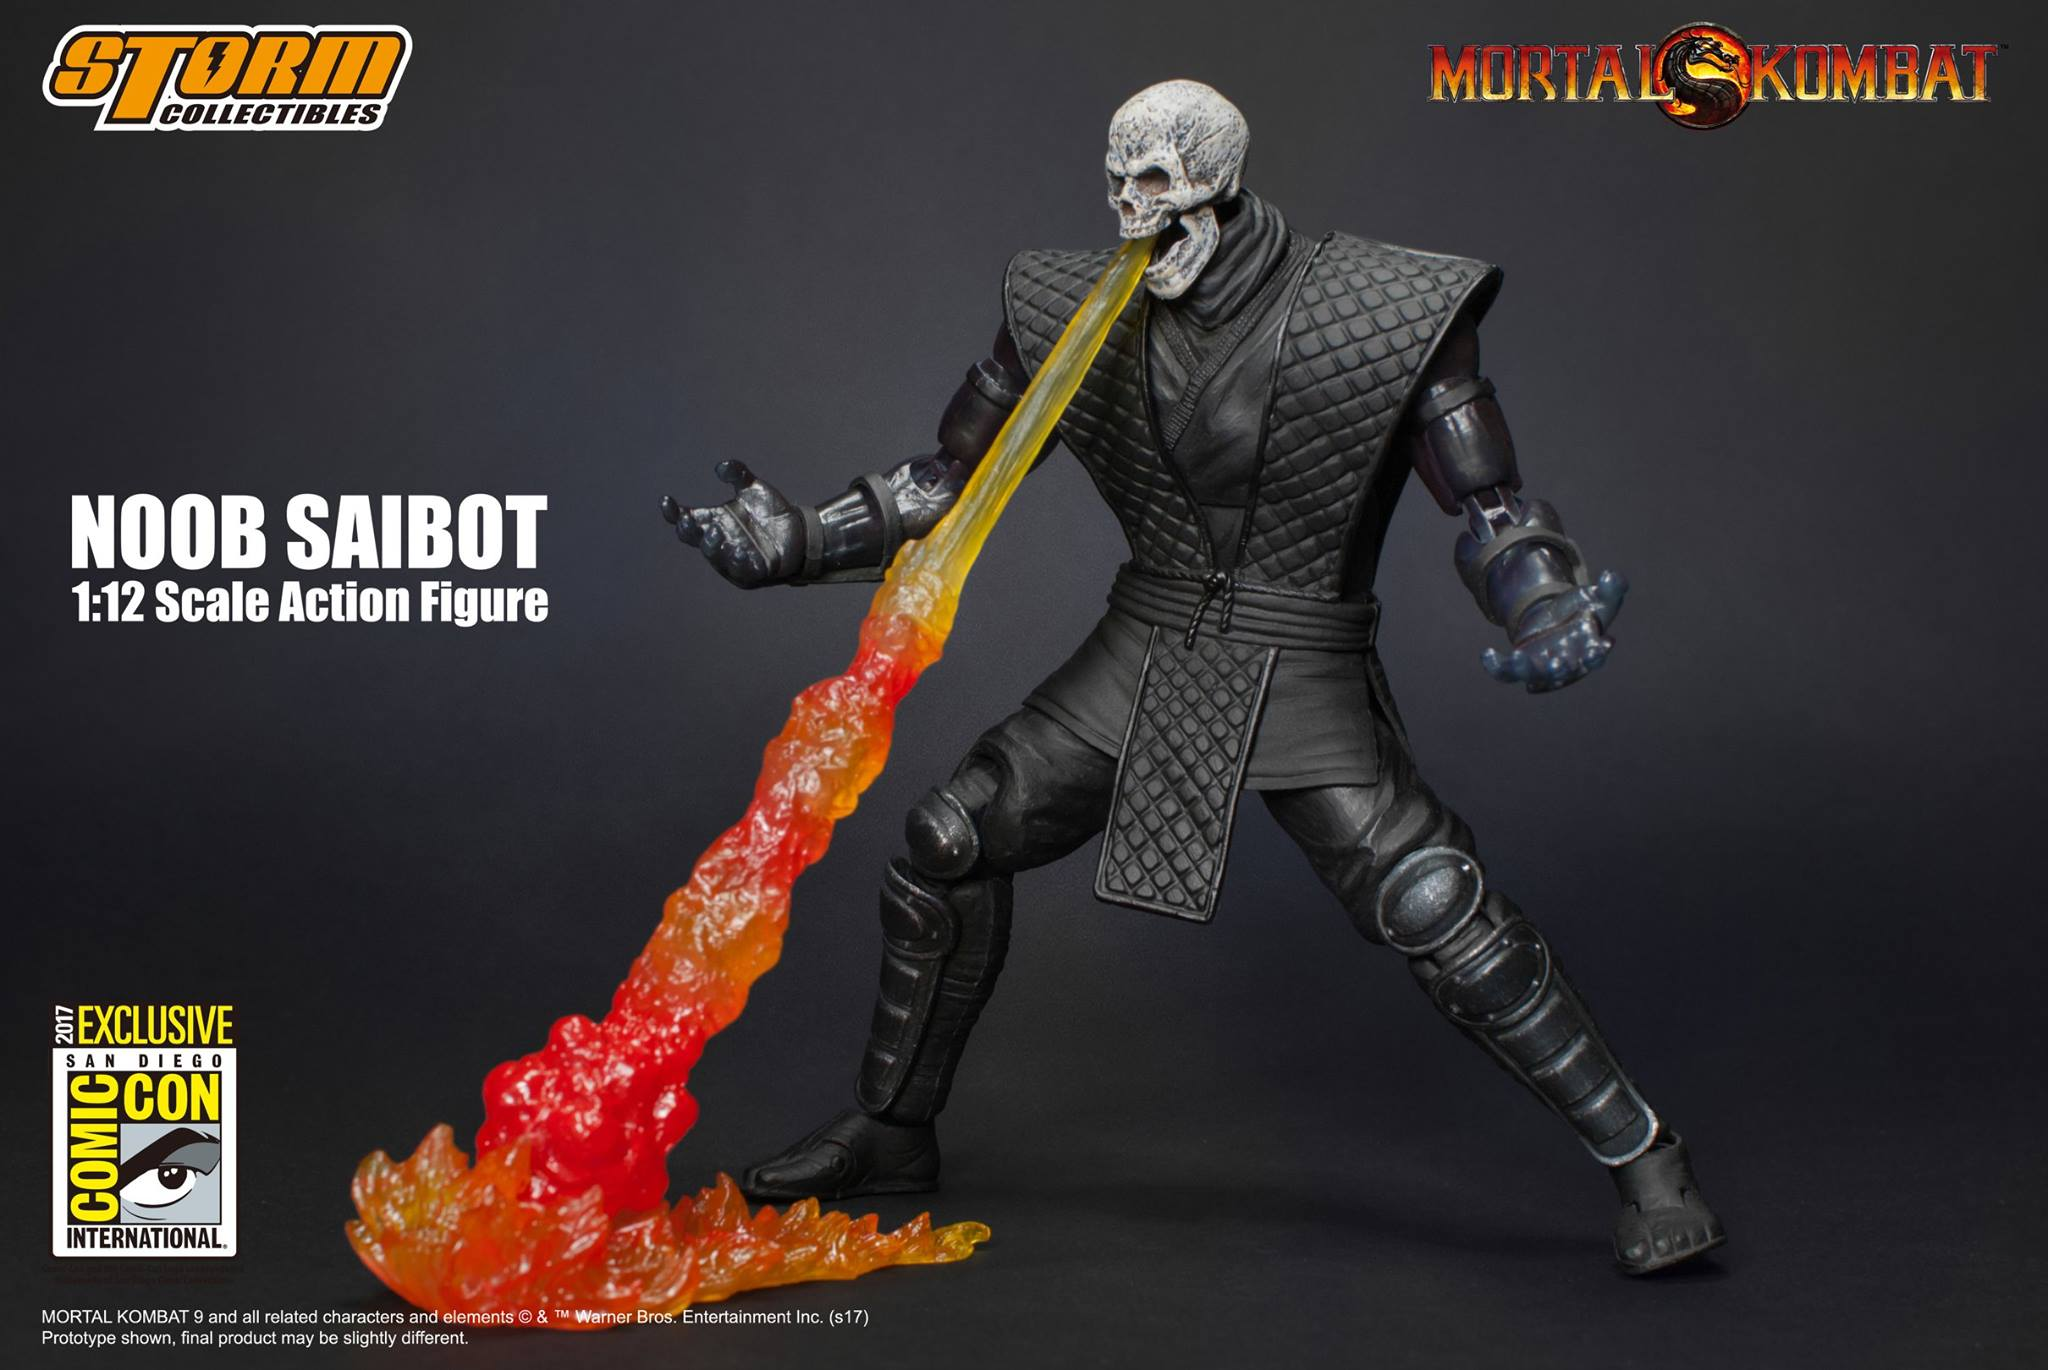 Storm Collectibles: Mortal Kombat Noob Saibot SDCC Exclusive